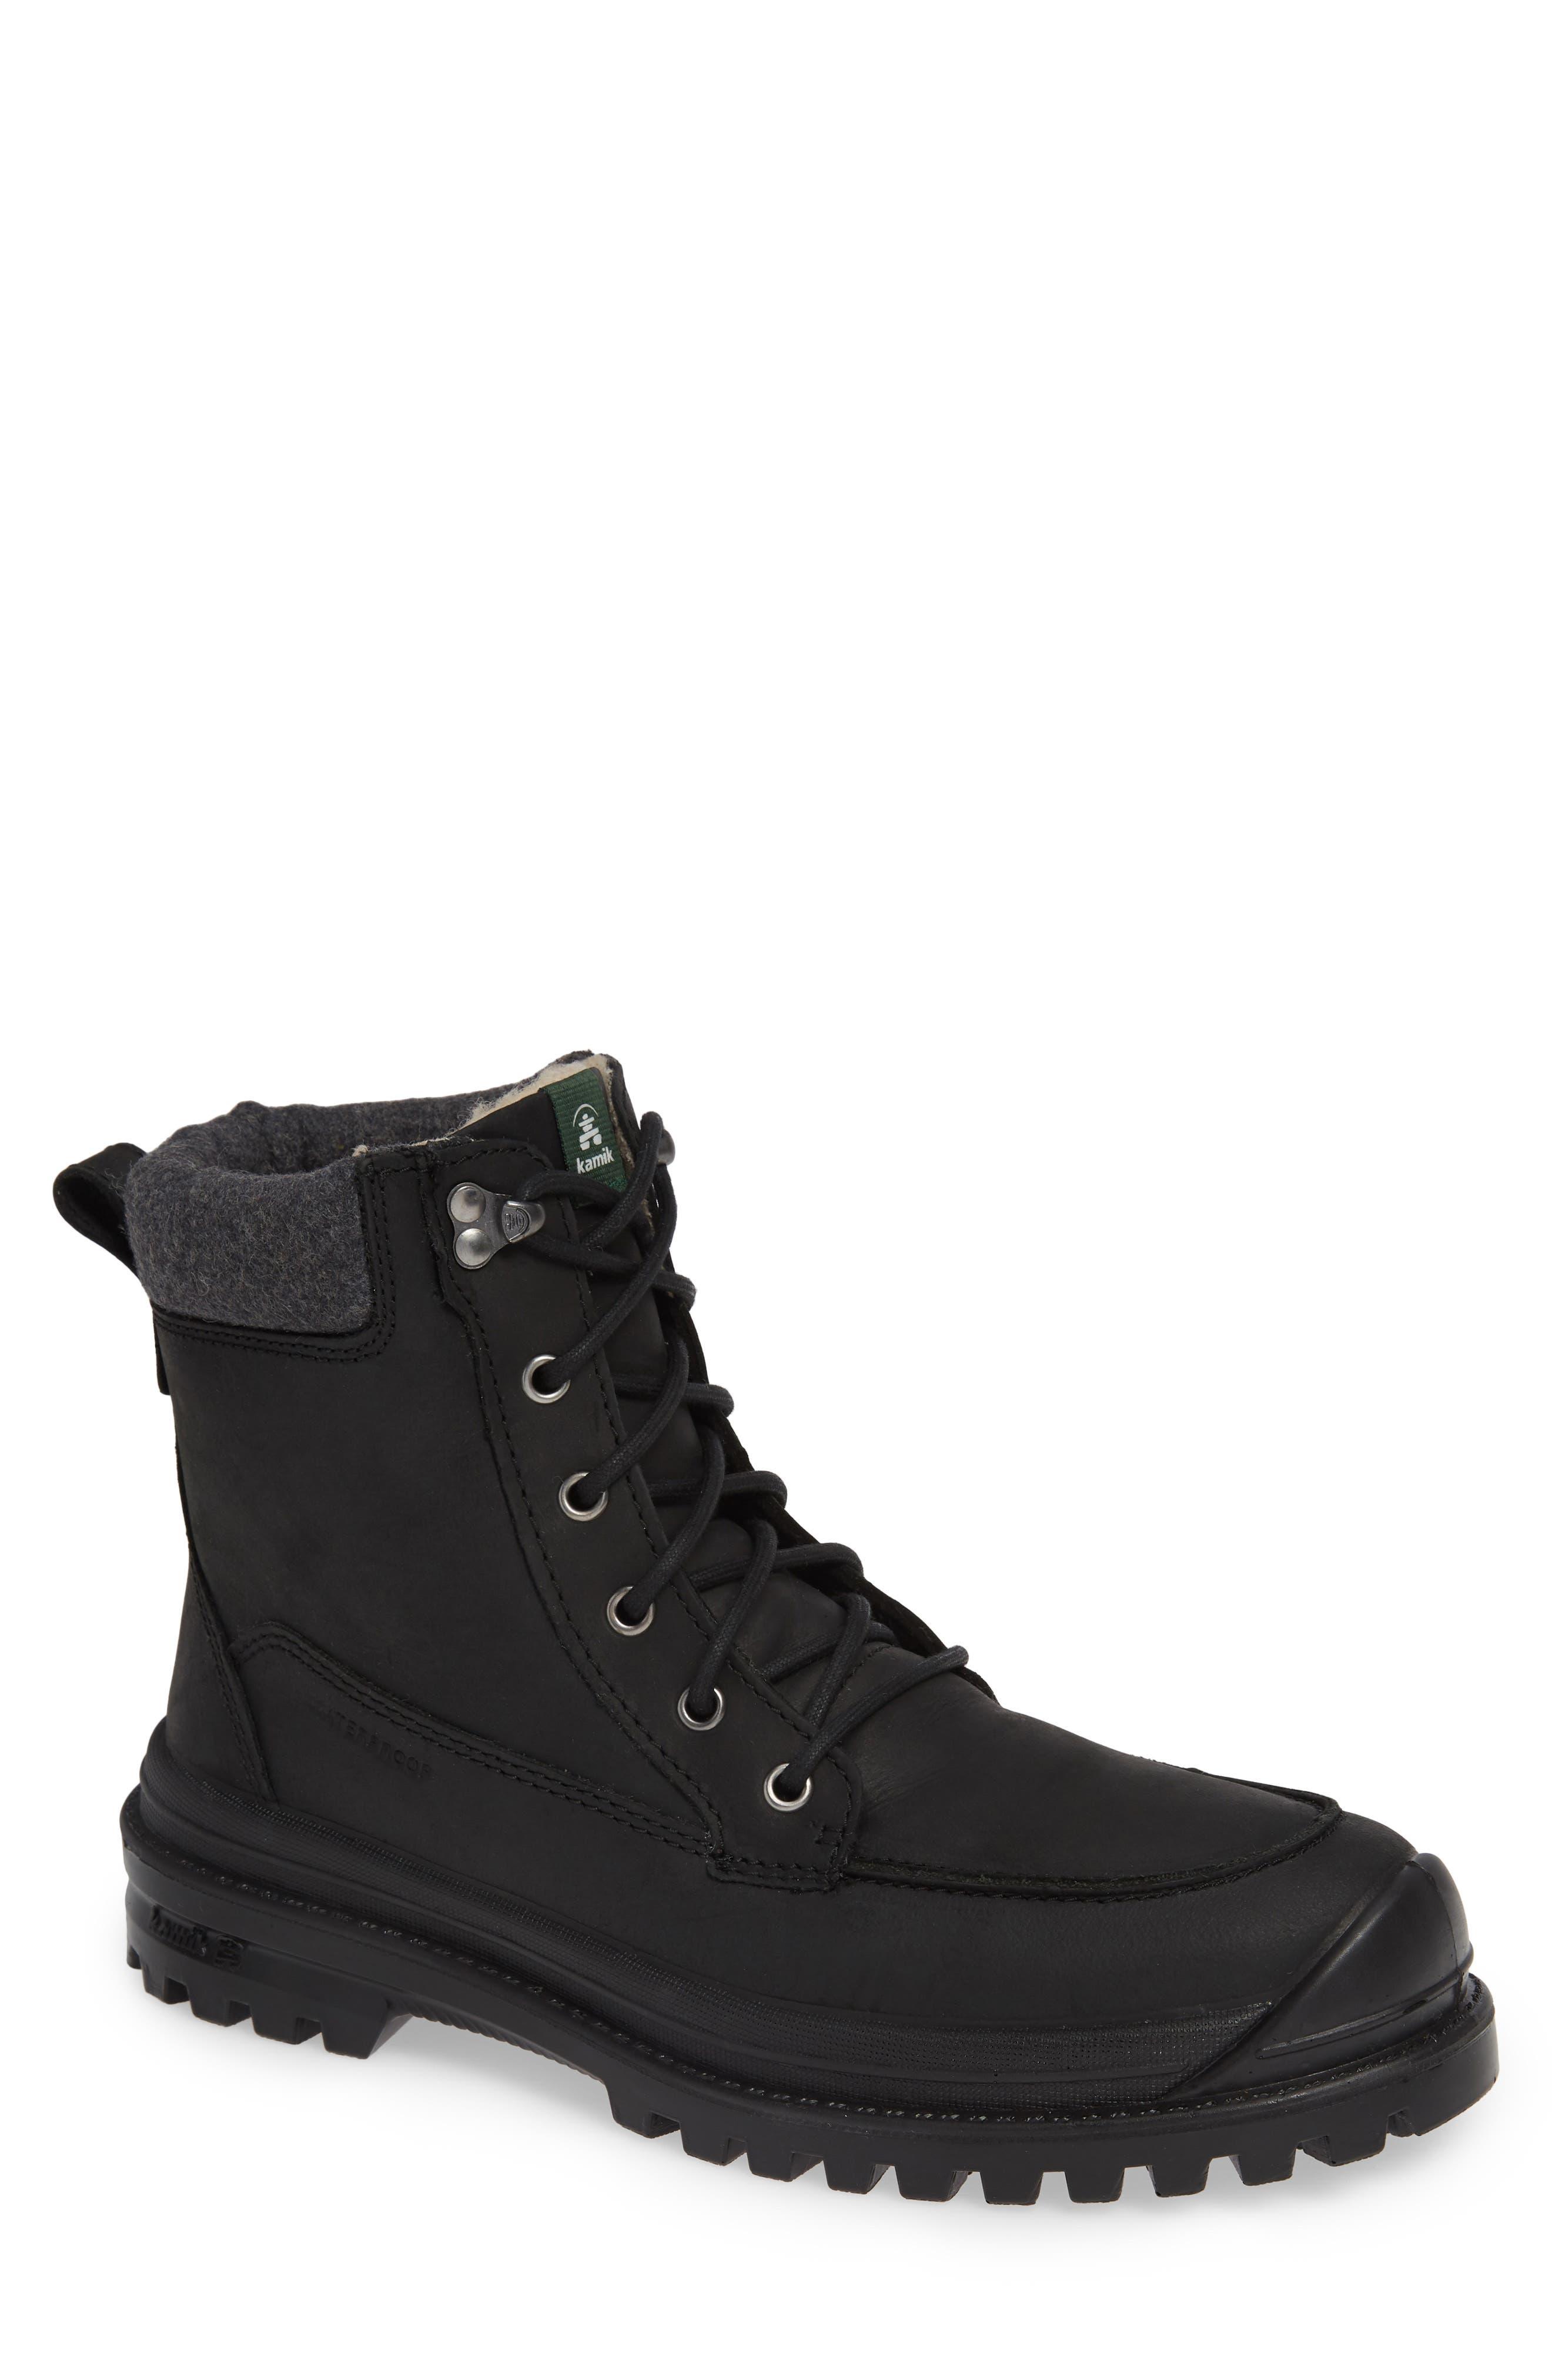 Kamik Griffon2 Snow Waterproof Boot With Faux Shearling, Black